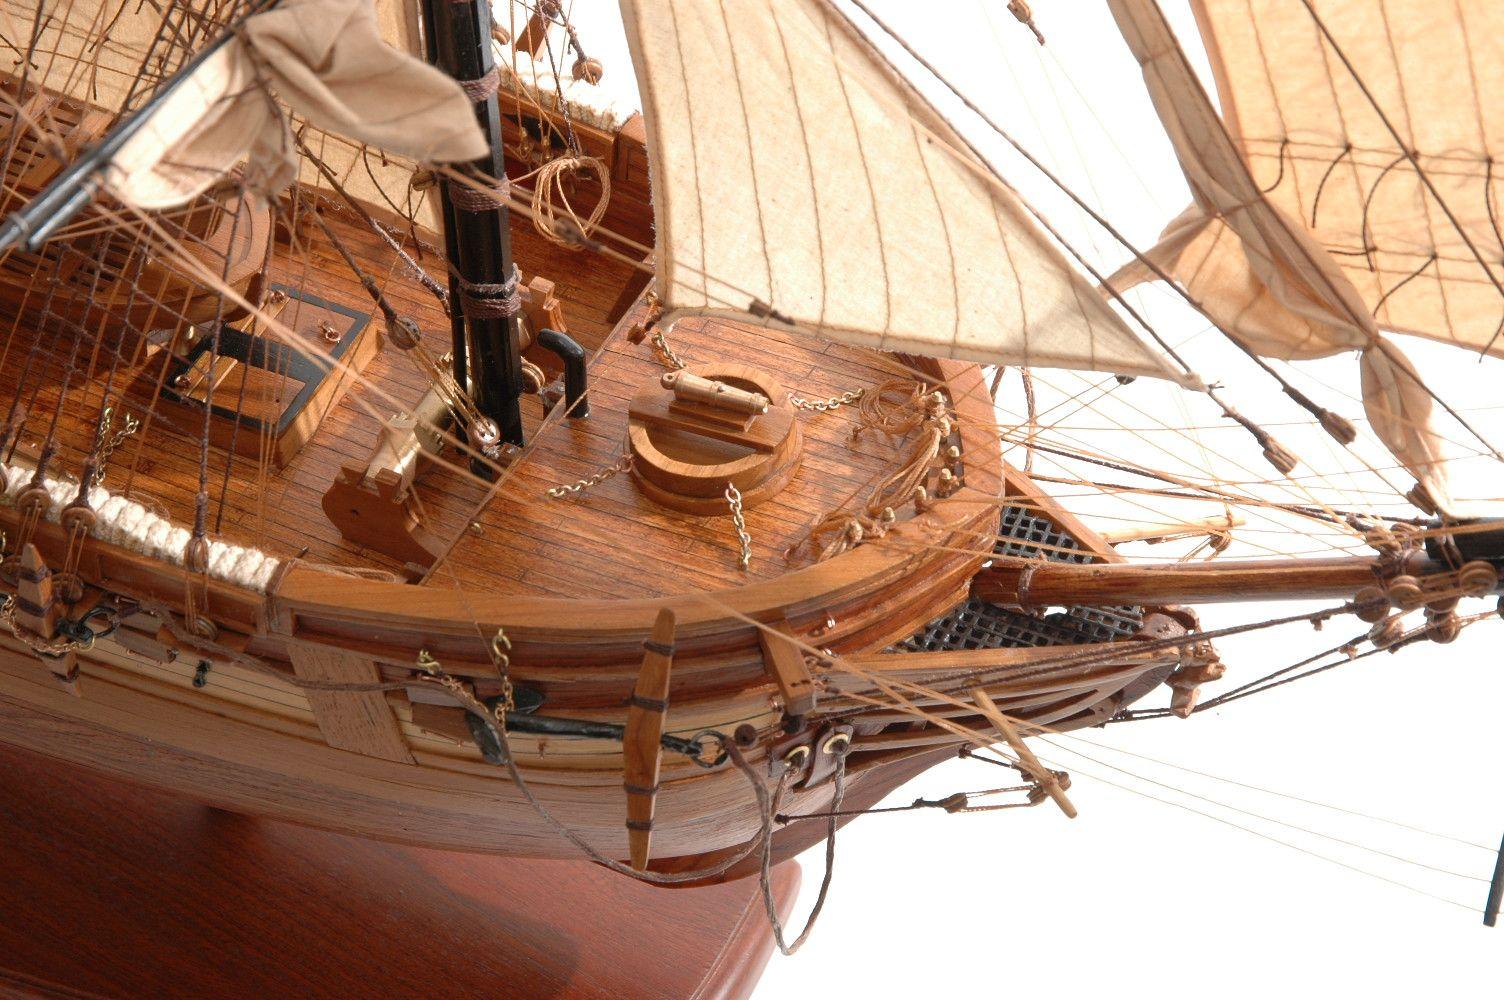 596-7316-HMS-Beagle-Model-Ship-Premier-Range